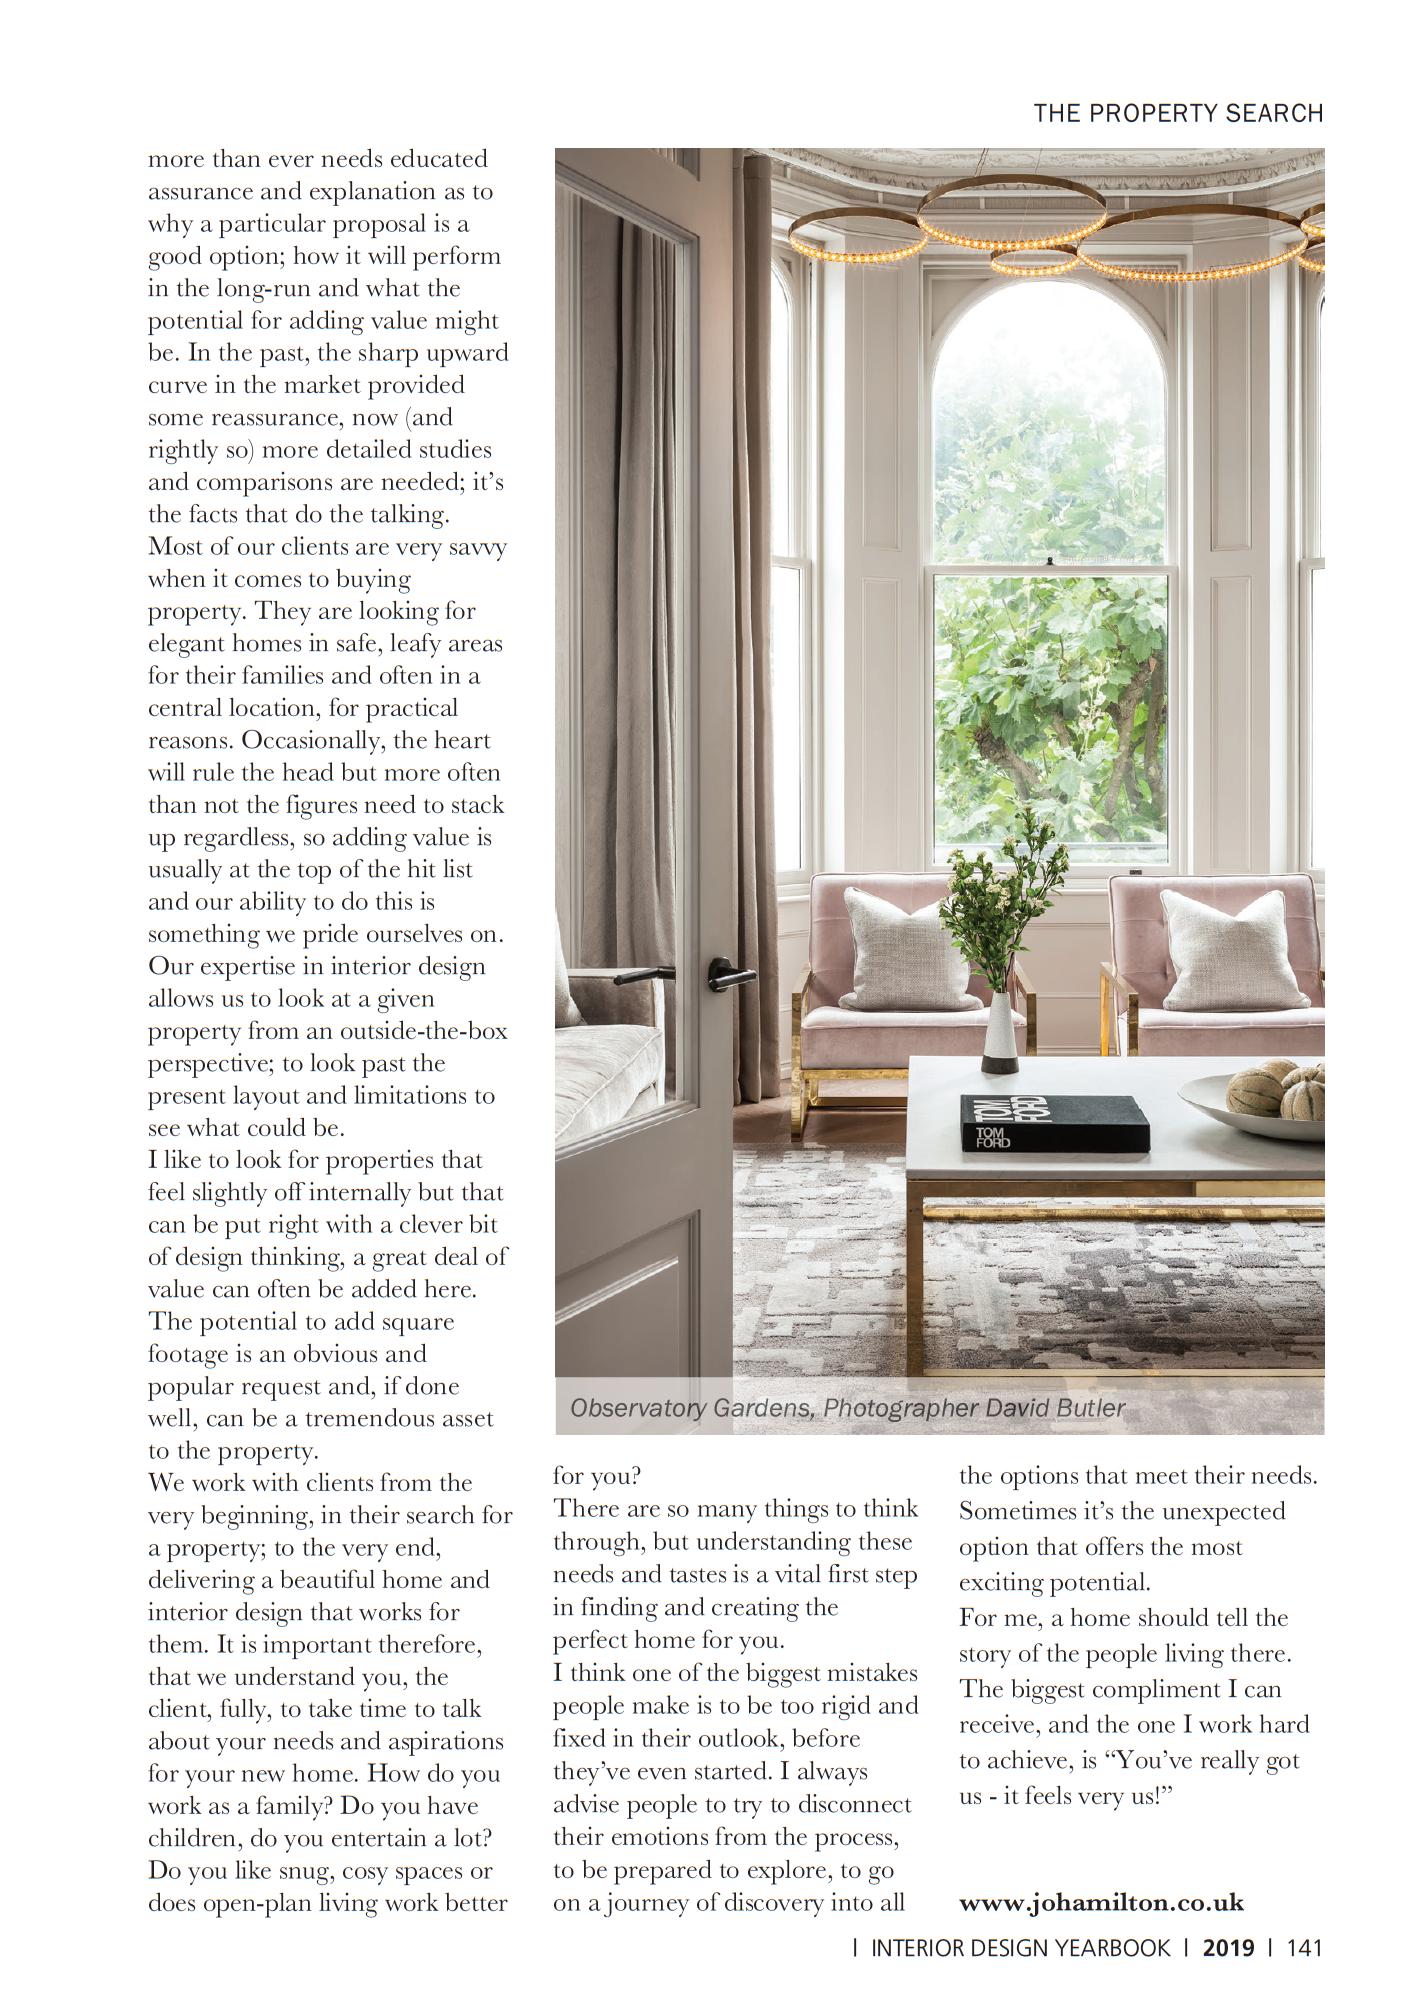 Interior Design Yearbook 2019 featuring luxury interior designer Jo Hamilton - consumer edition page 141